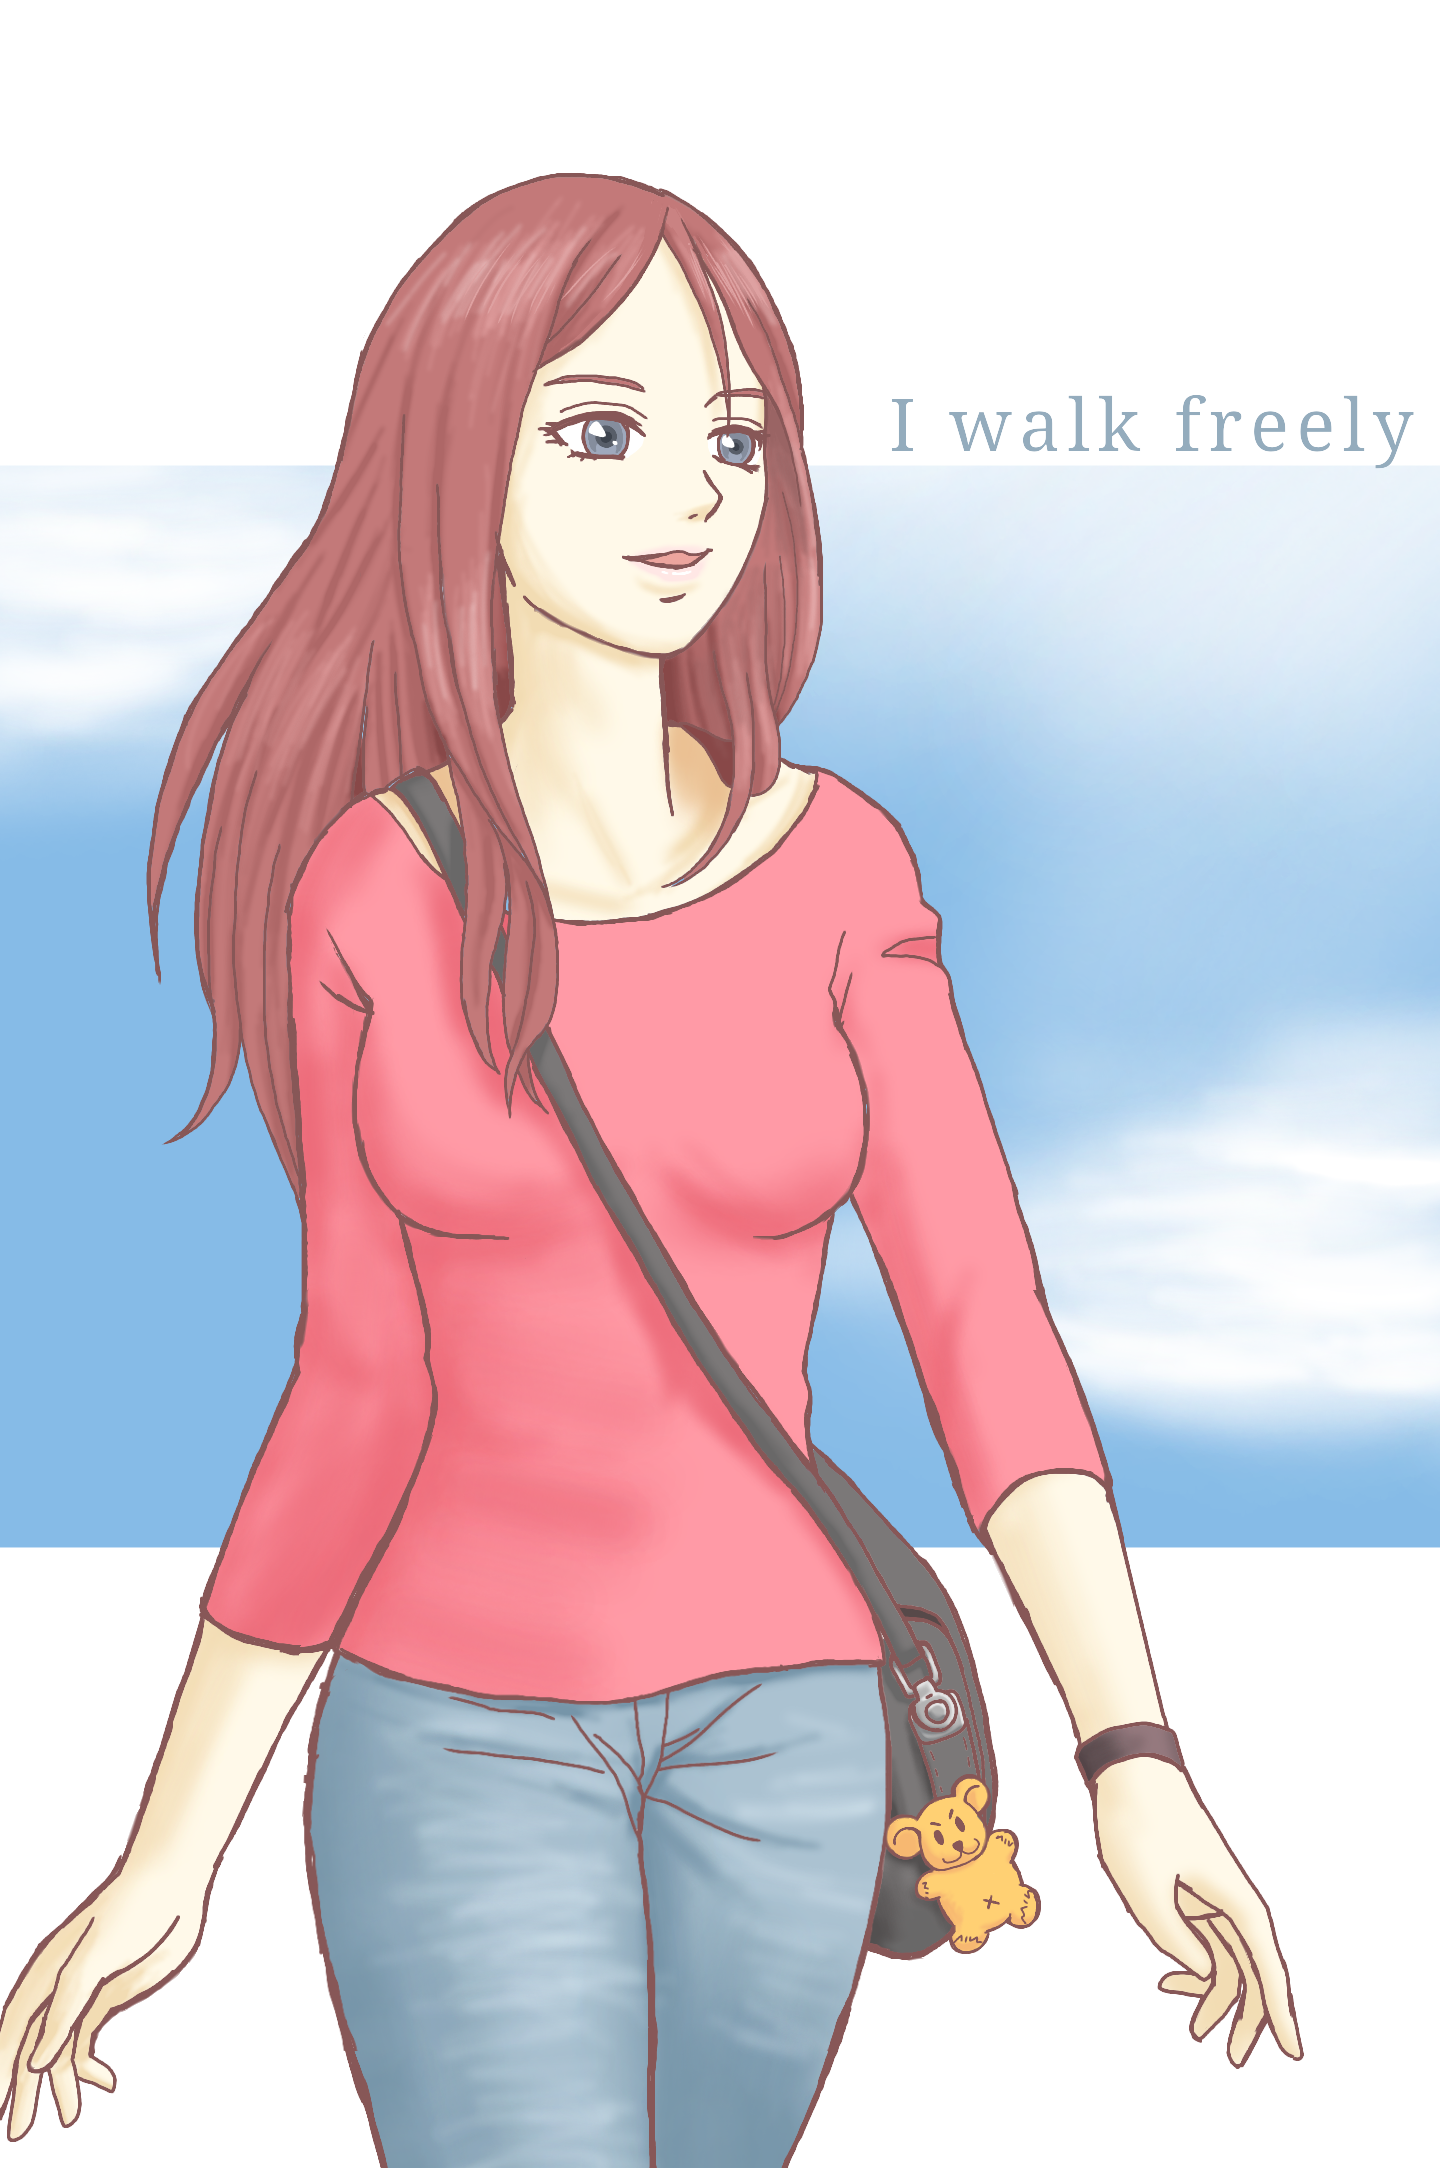 I Walk Freely